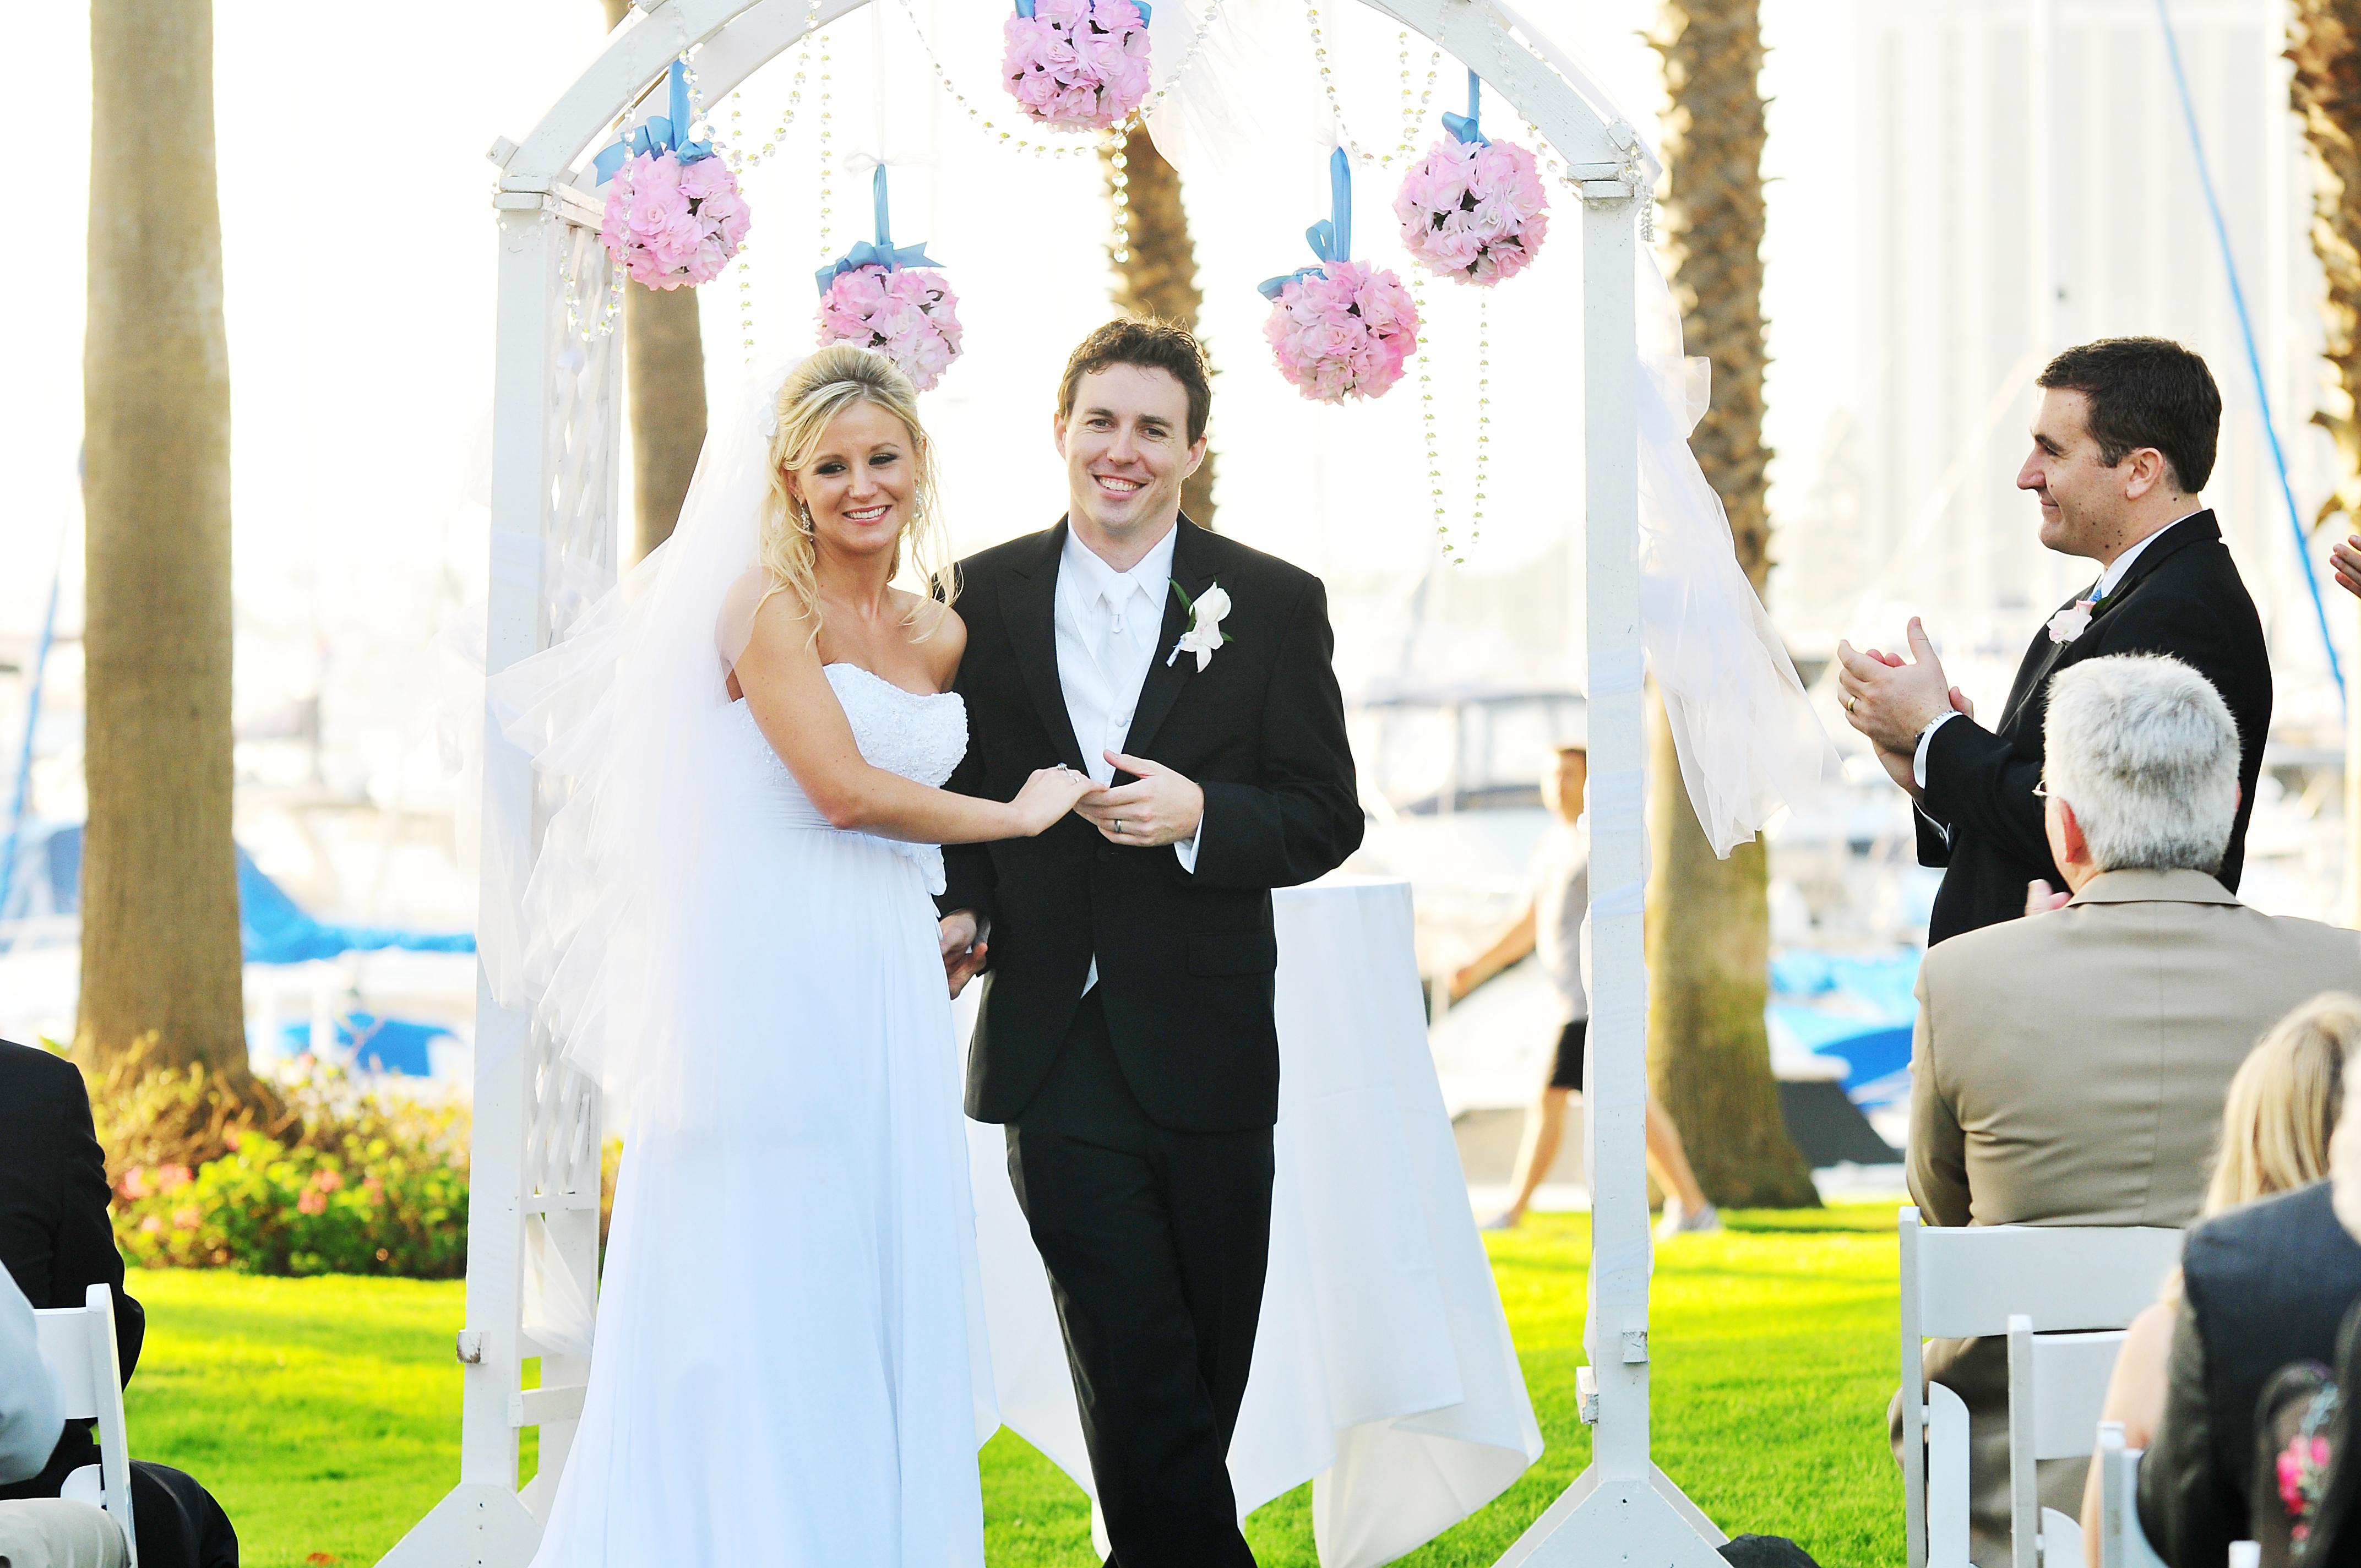 san diego ceremony, steph wong weddings, southern california wedding ceremony, beach ceremony, marina village ceremony